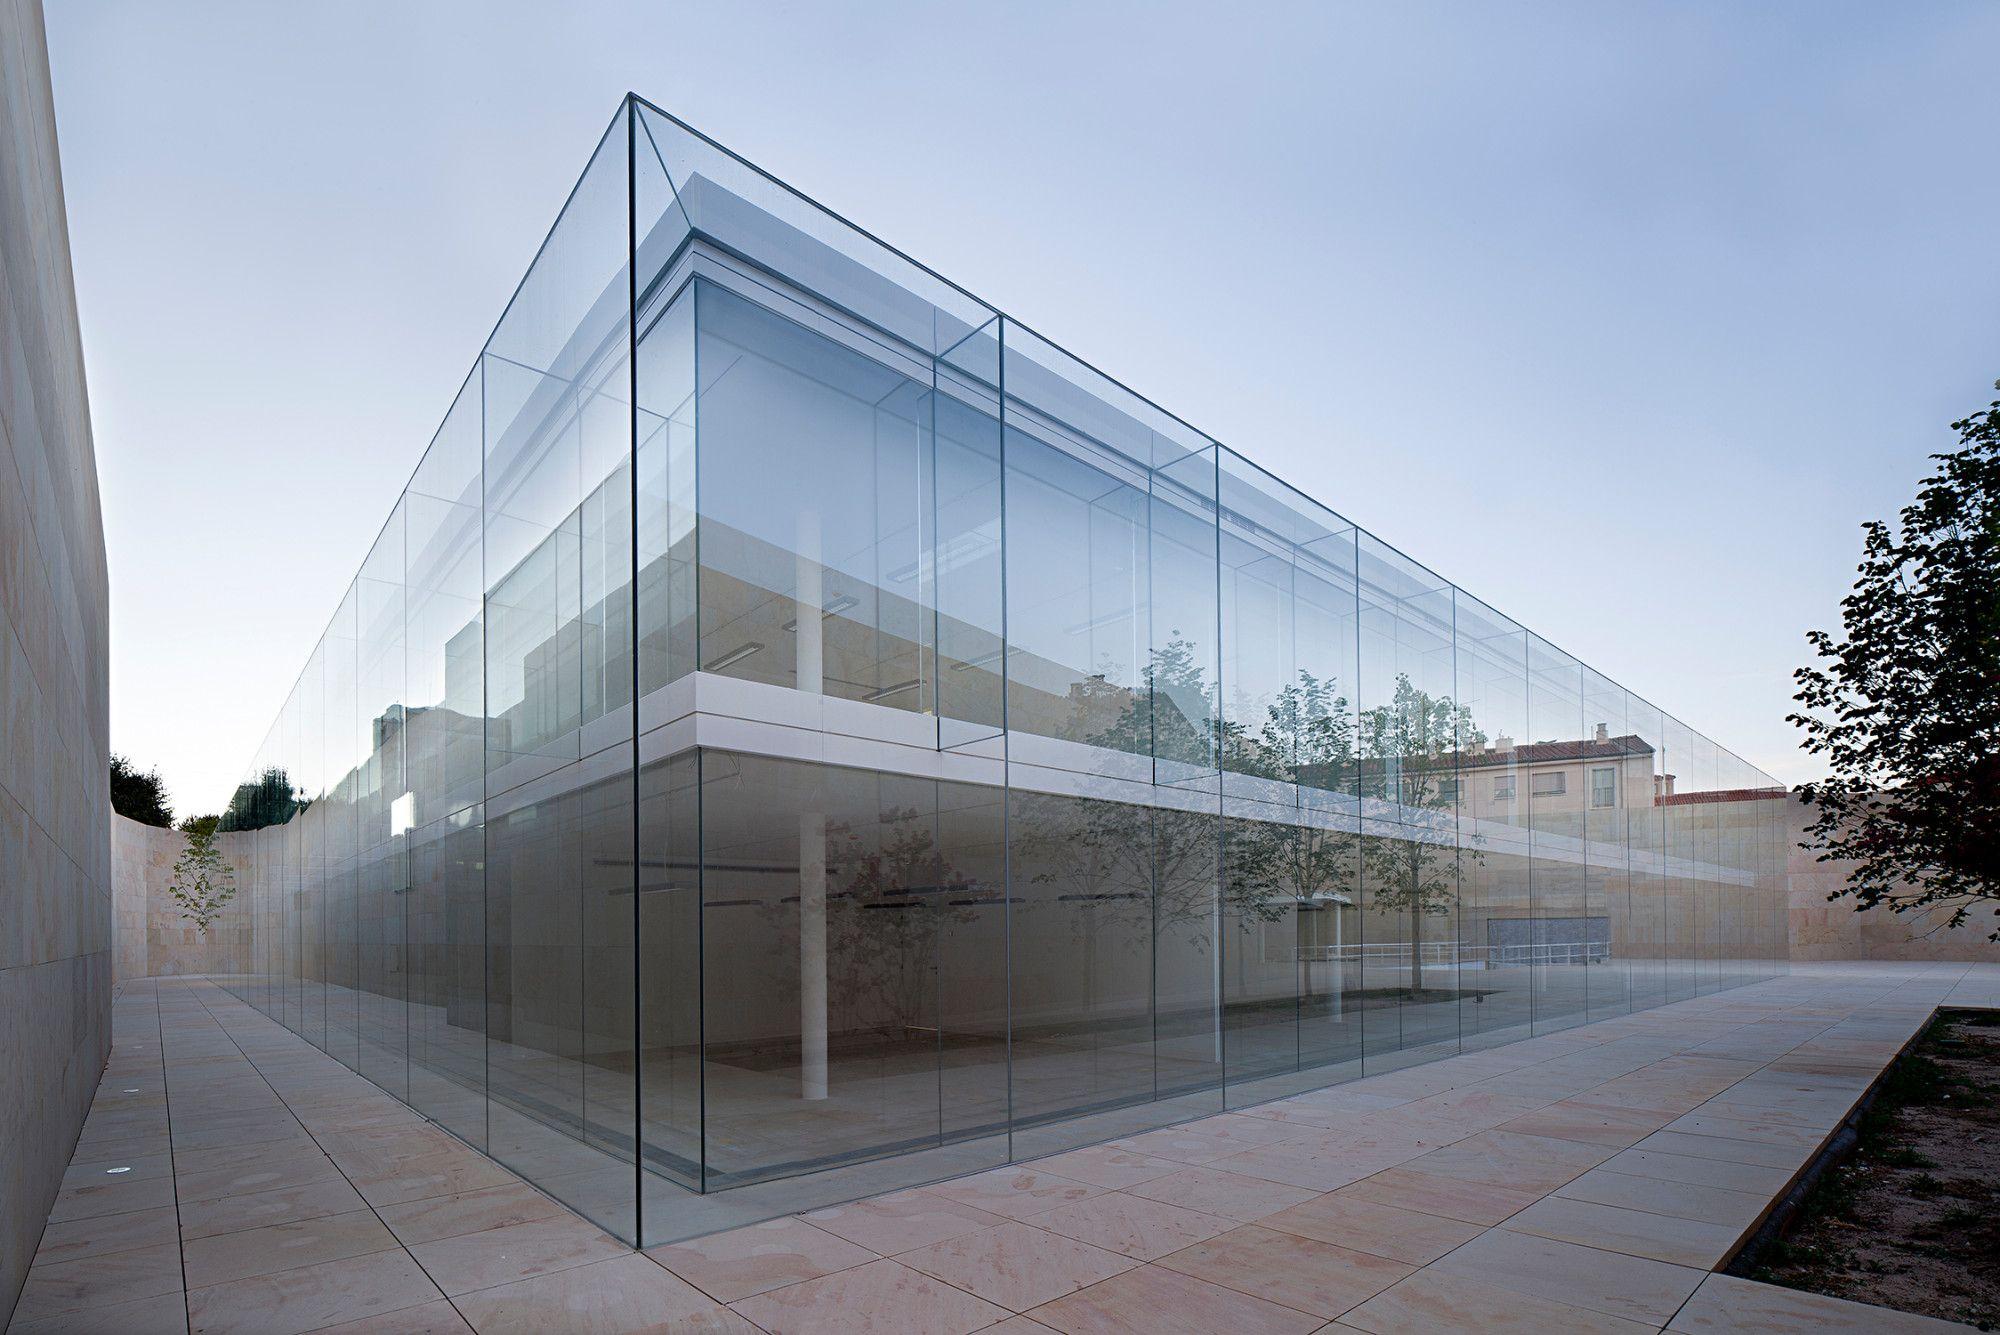 Fassade glas  Verwaltungsgebäude der Junta de Castilla y León in Zamora ...